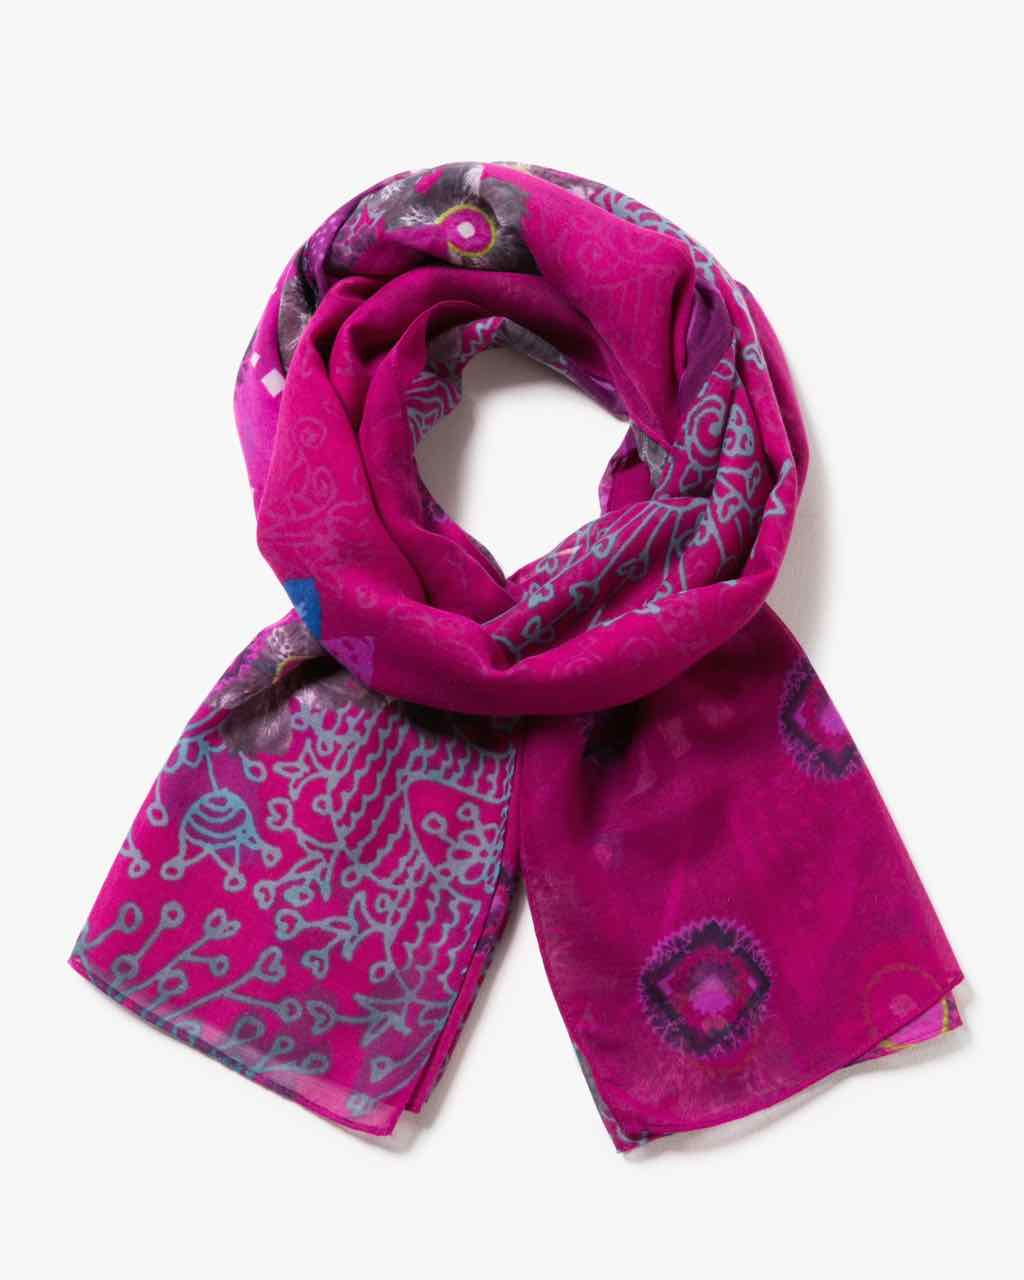 17WAWFE8_3070 Desigual Scarf Rectangle Bollywood Burgundy Purple Buy Online